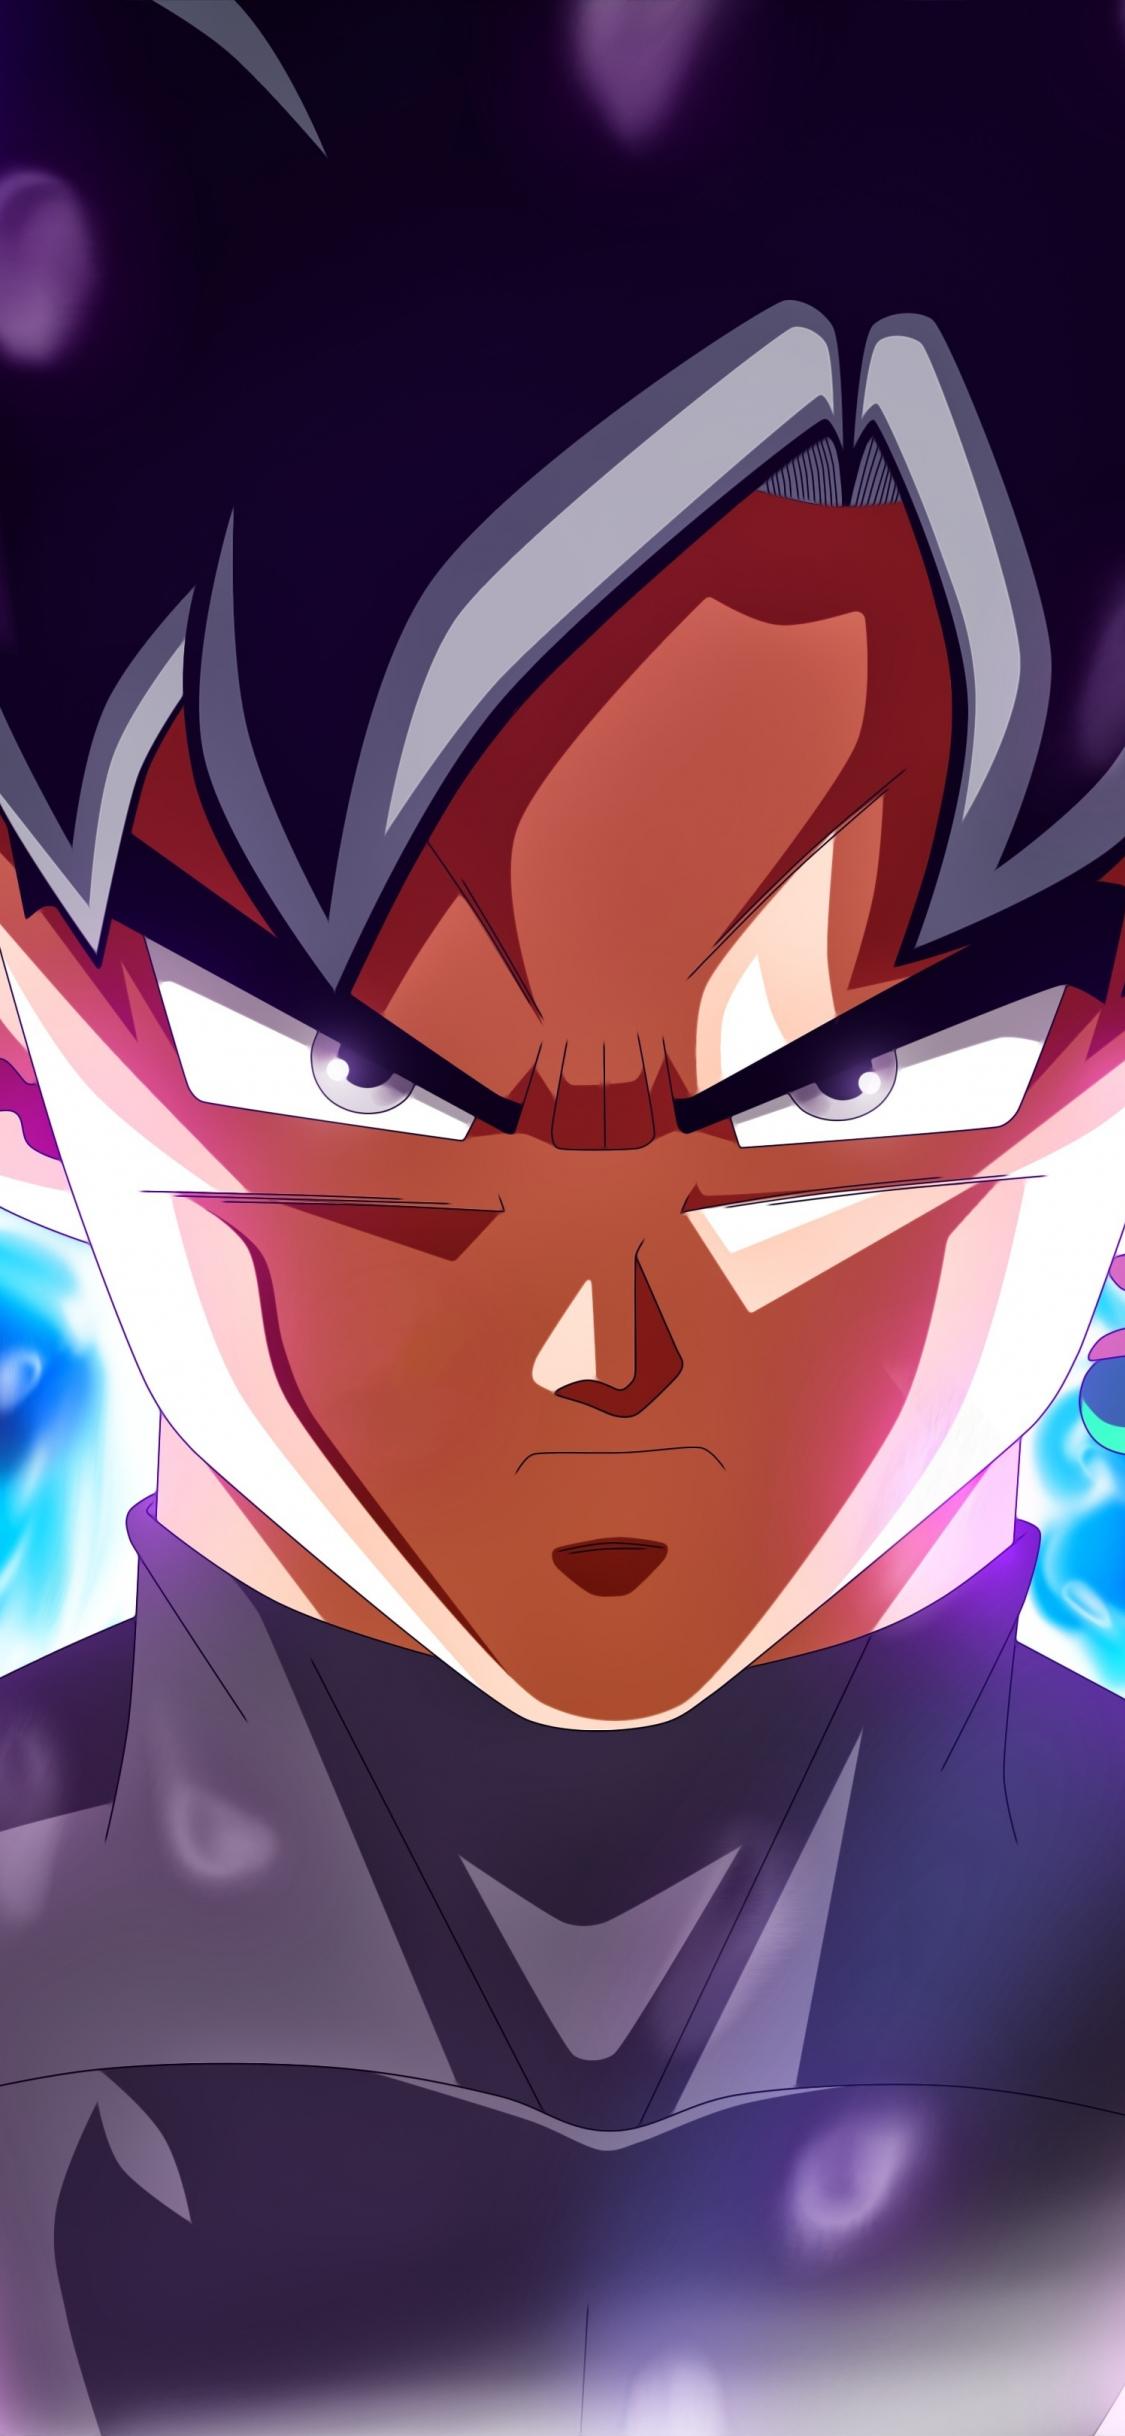 Download 1125x2436 Wallpaper Ultra Instinct Dragon Ball Black Goku